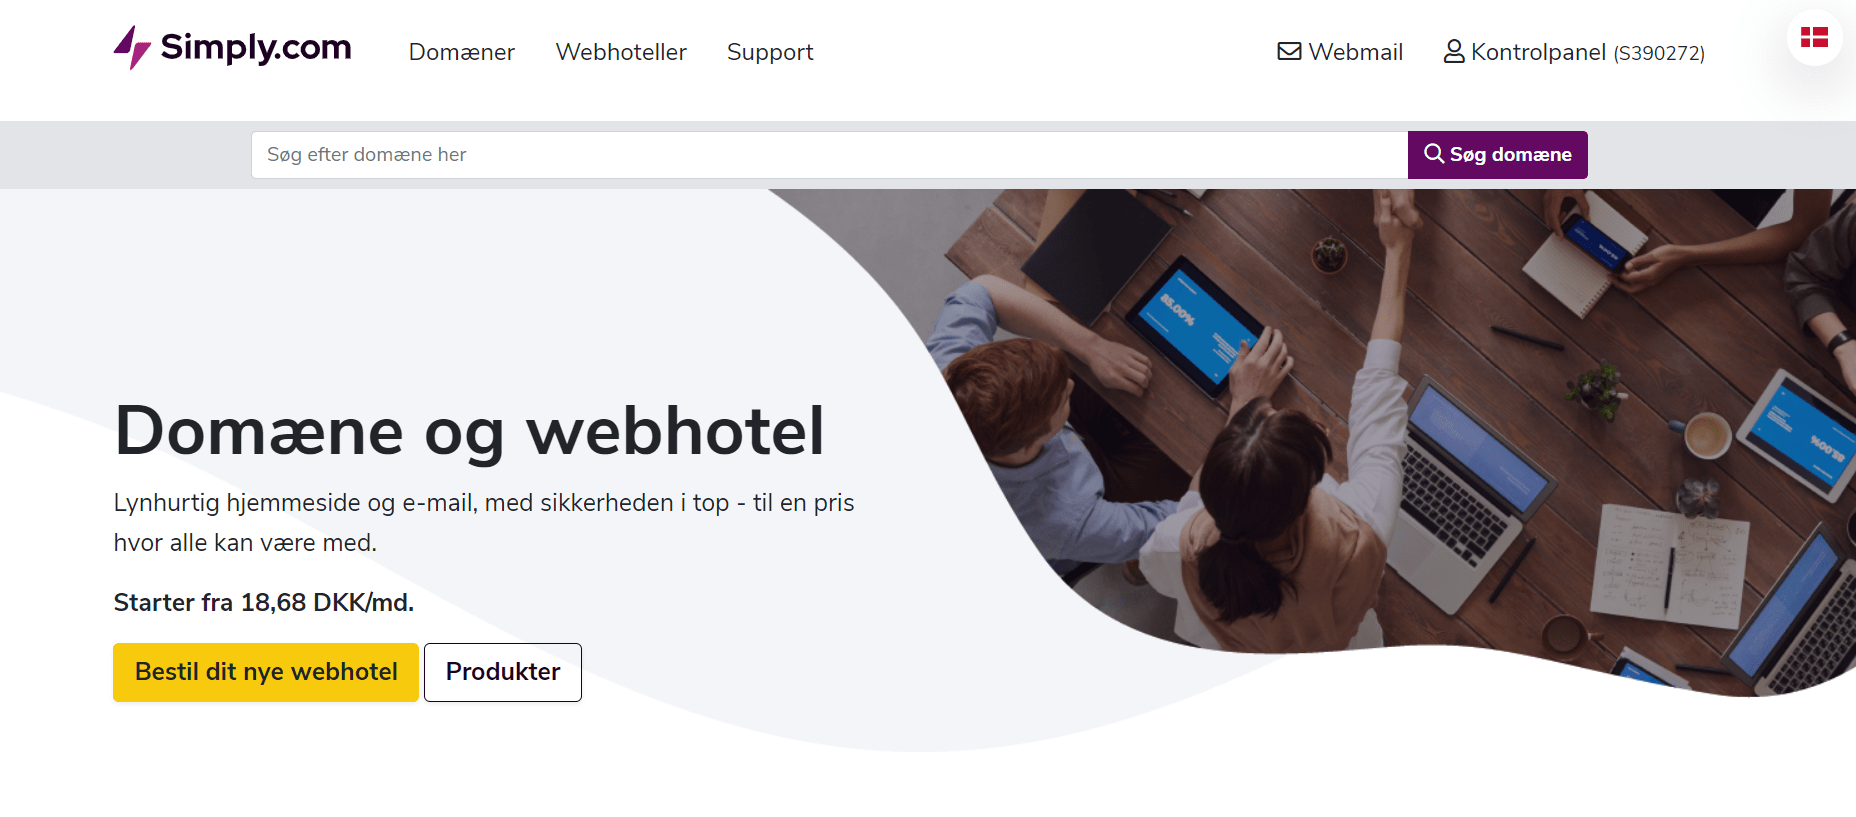 Simply.com – Fantastisk host, eller får man det man betaler for?